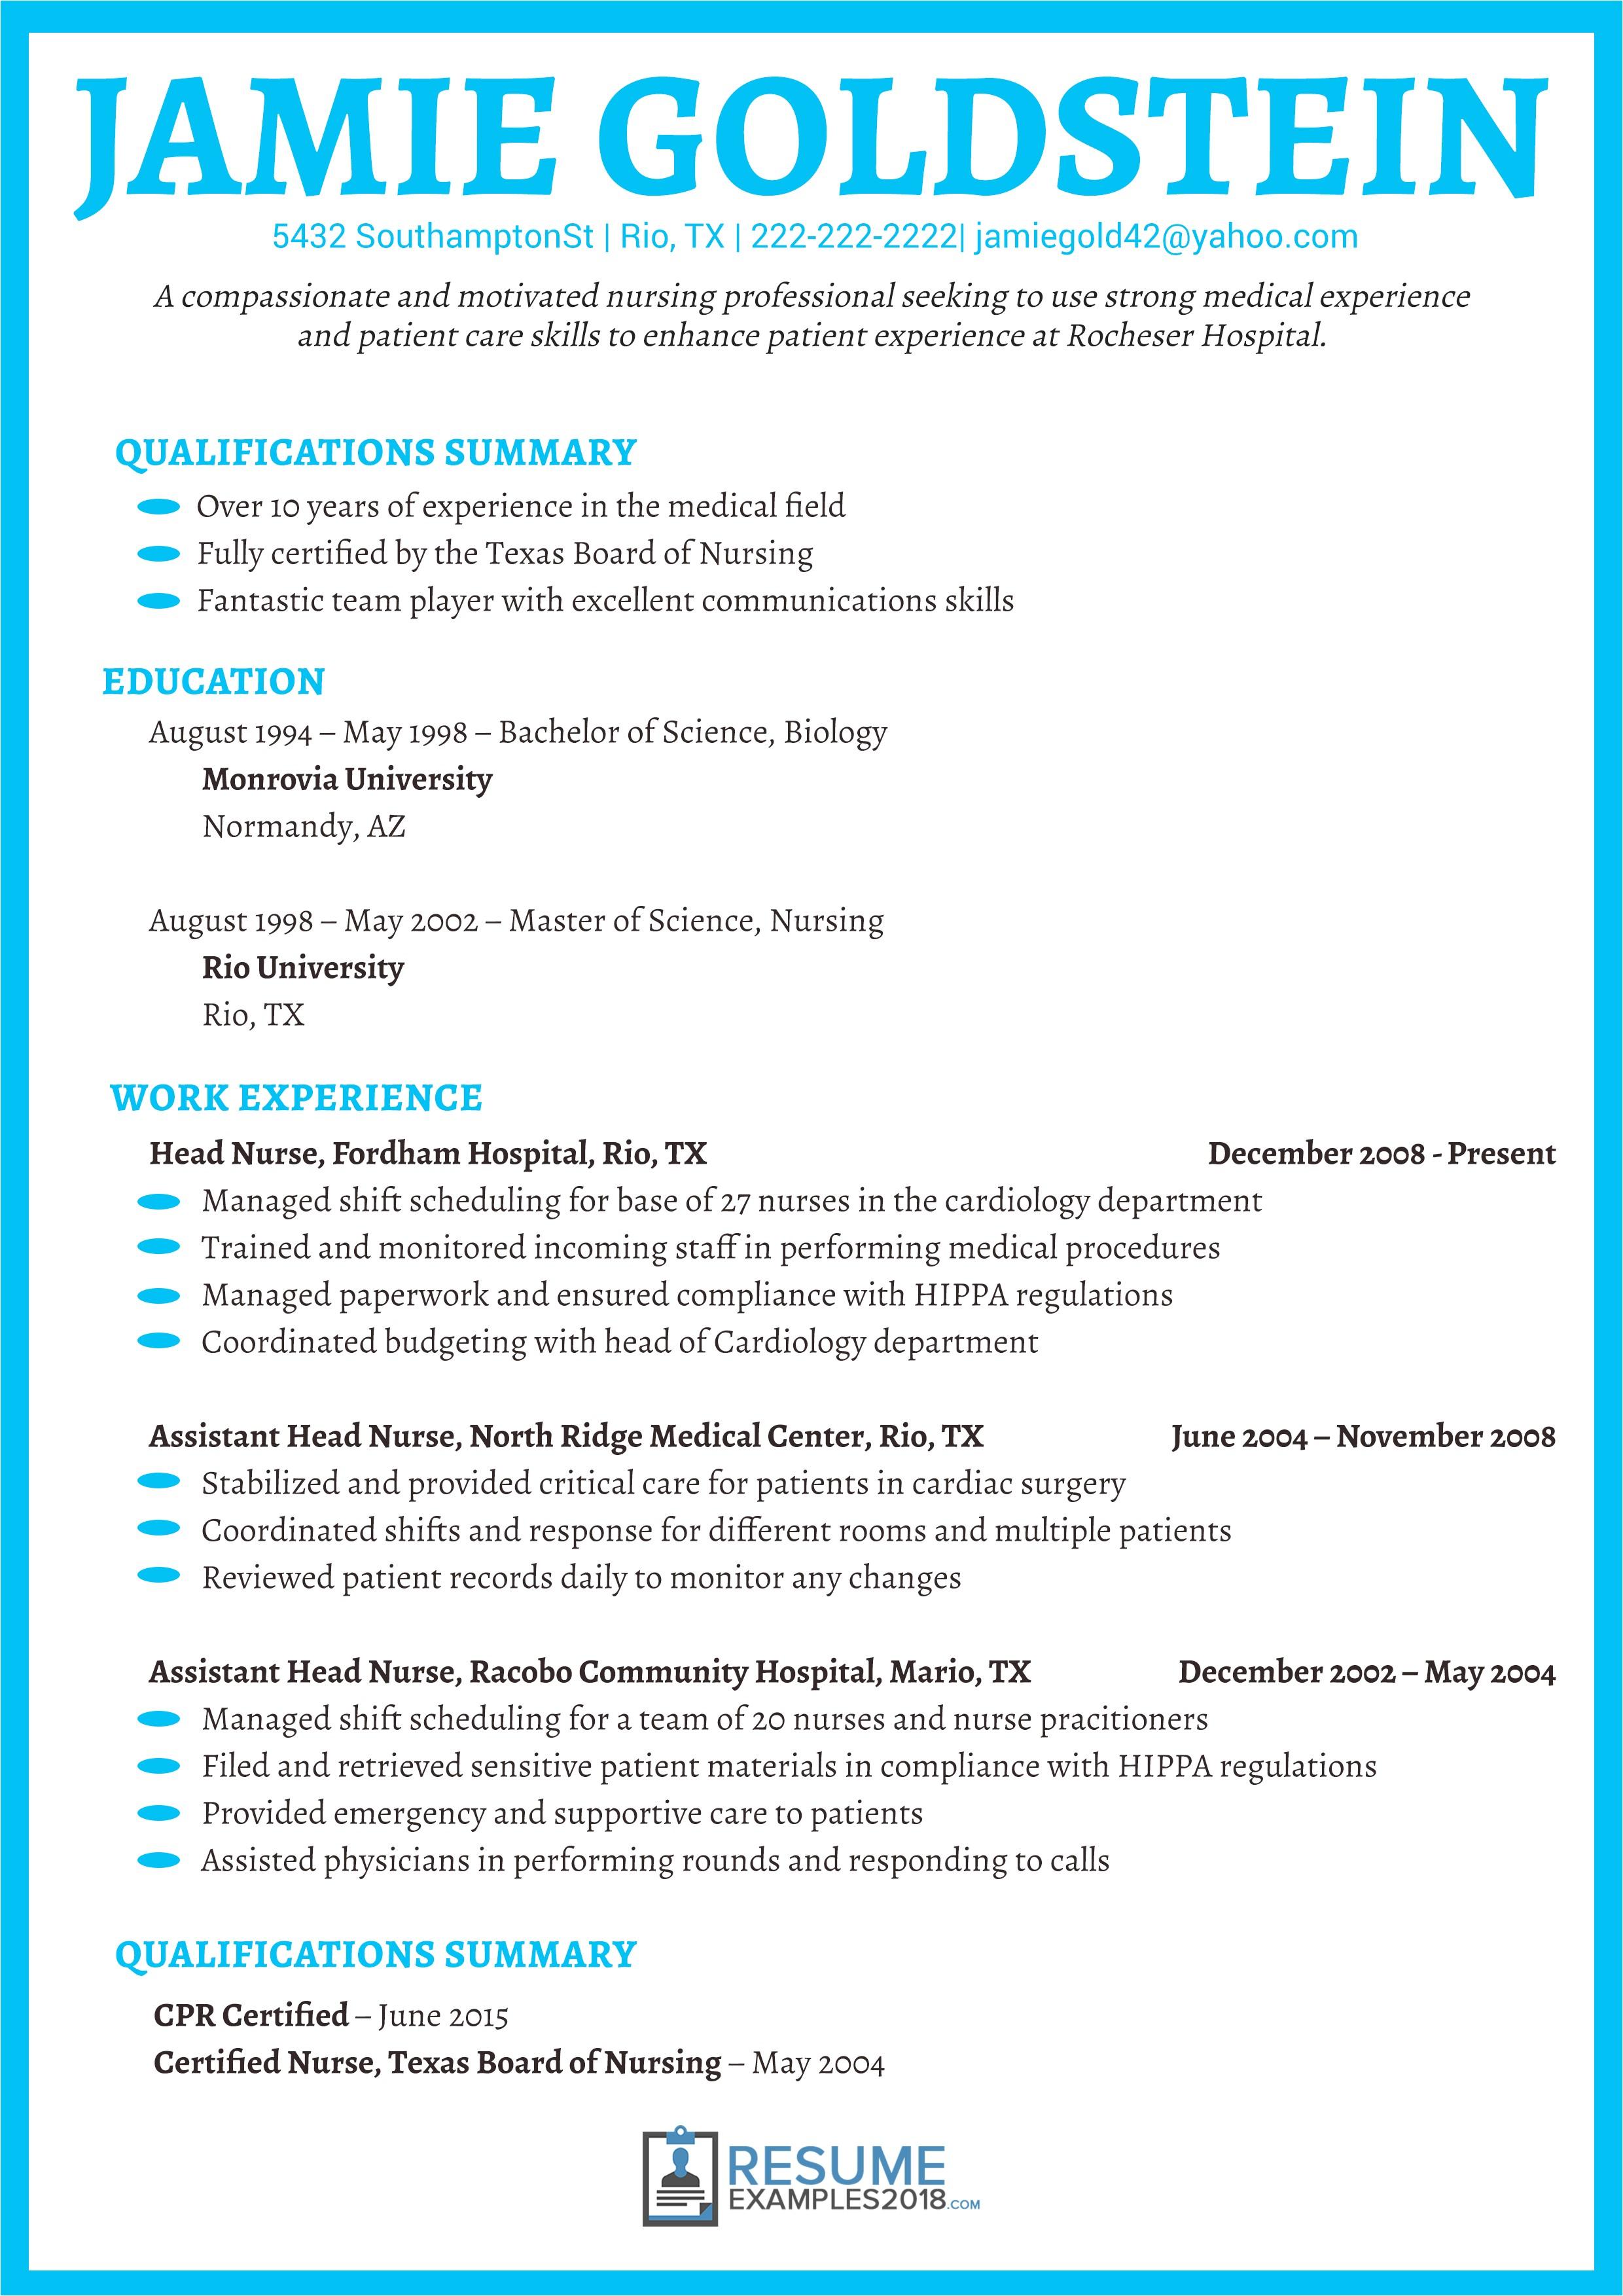 job resume template 2018